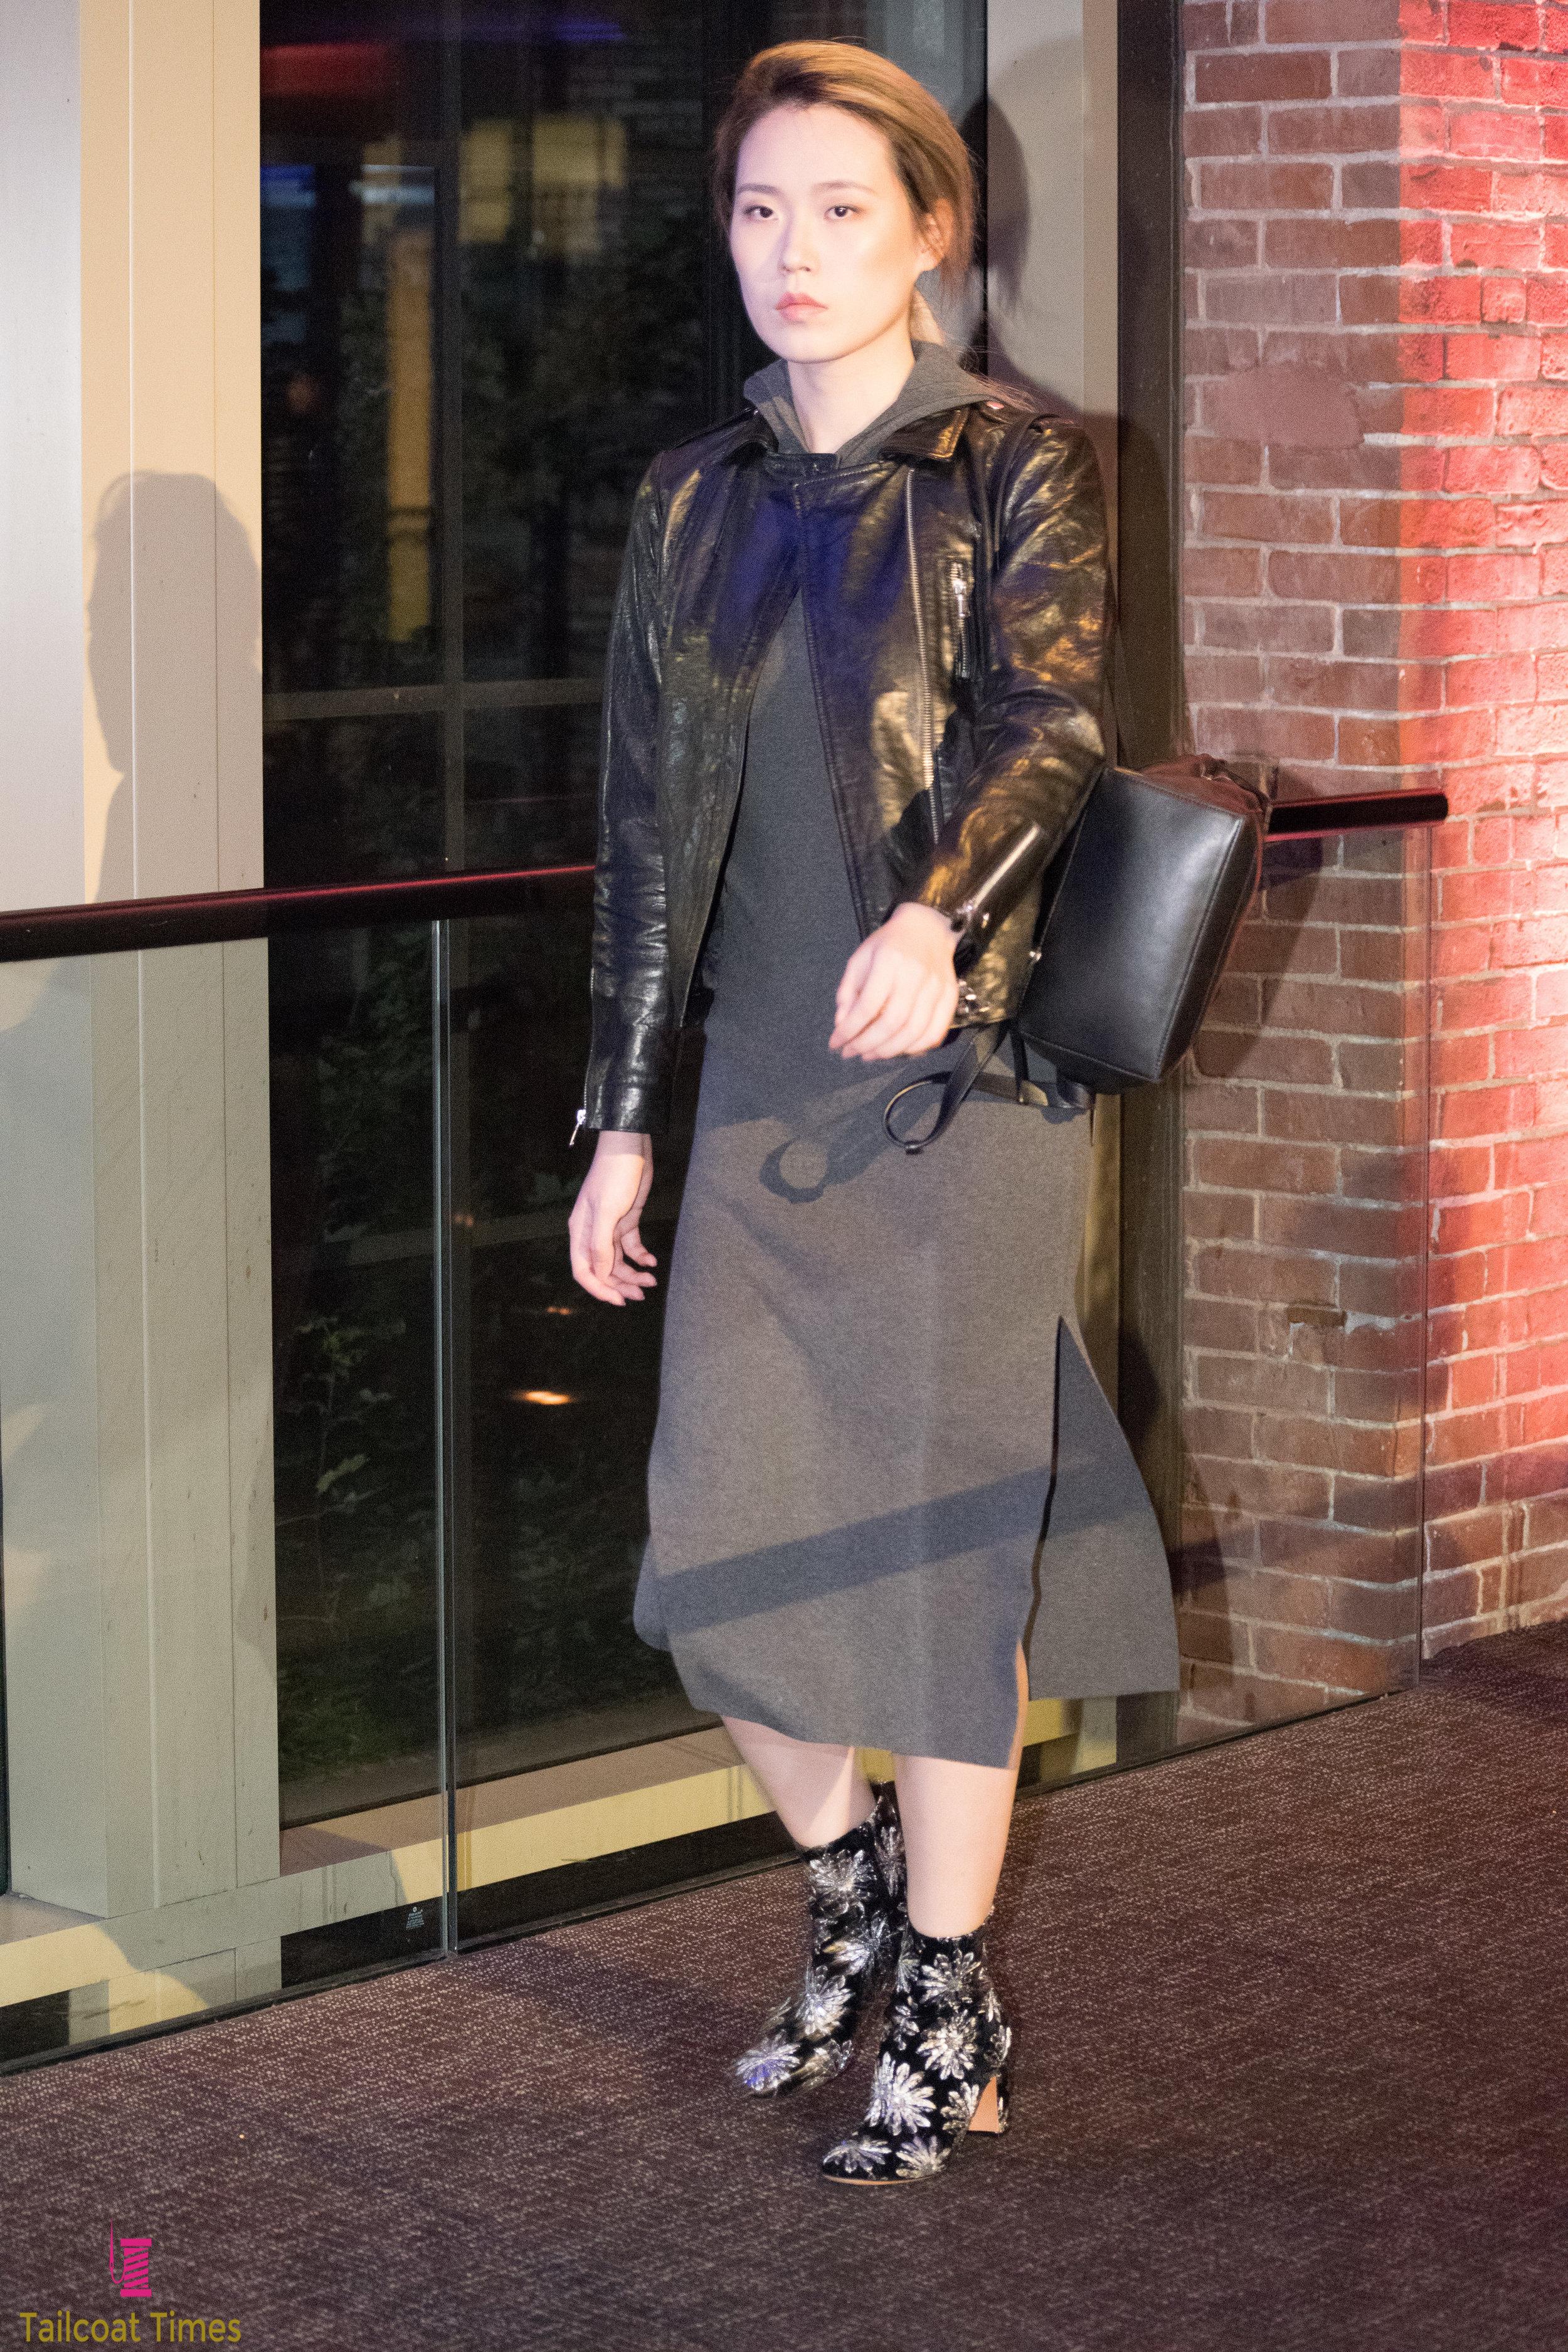 FashionablyLate_TrunkShow_Tailcoat Times (35 of 48).jpg